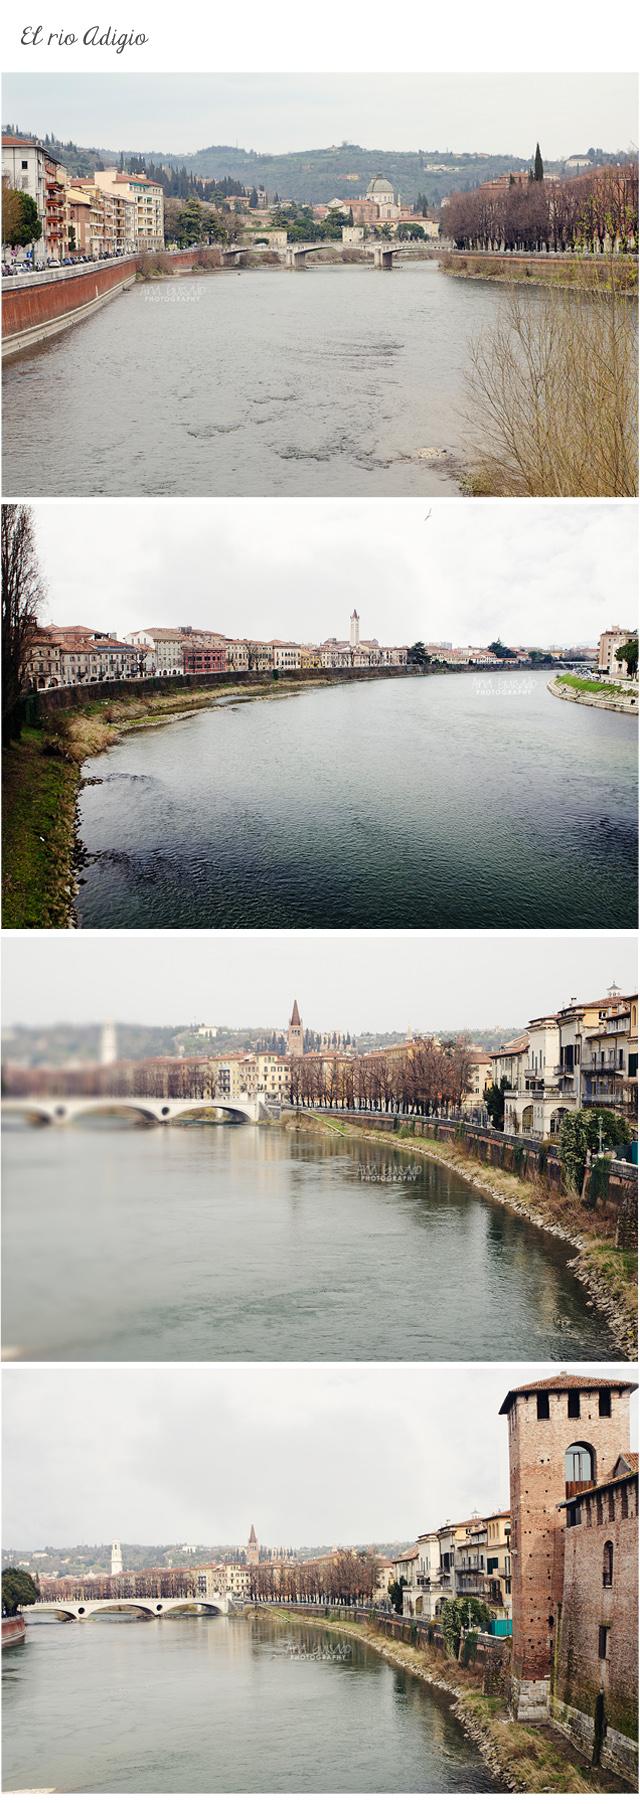 20130323_Verona_6